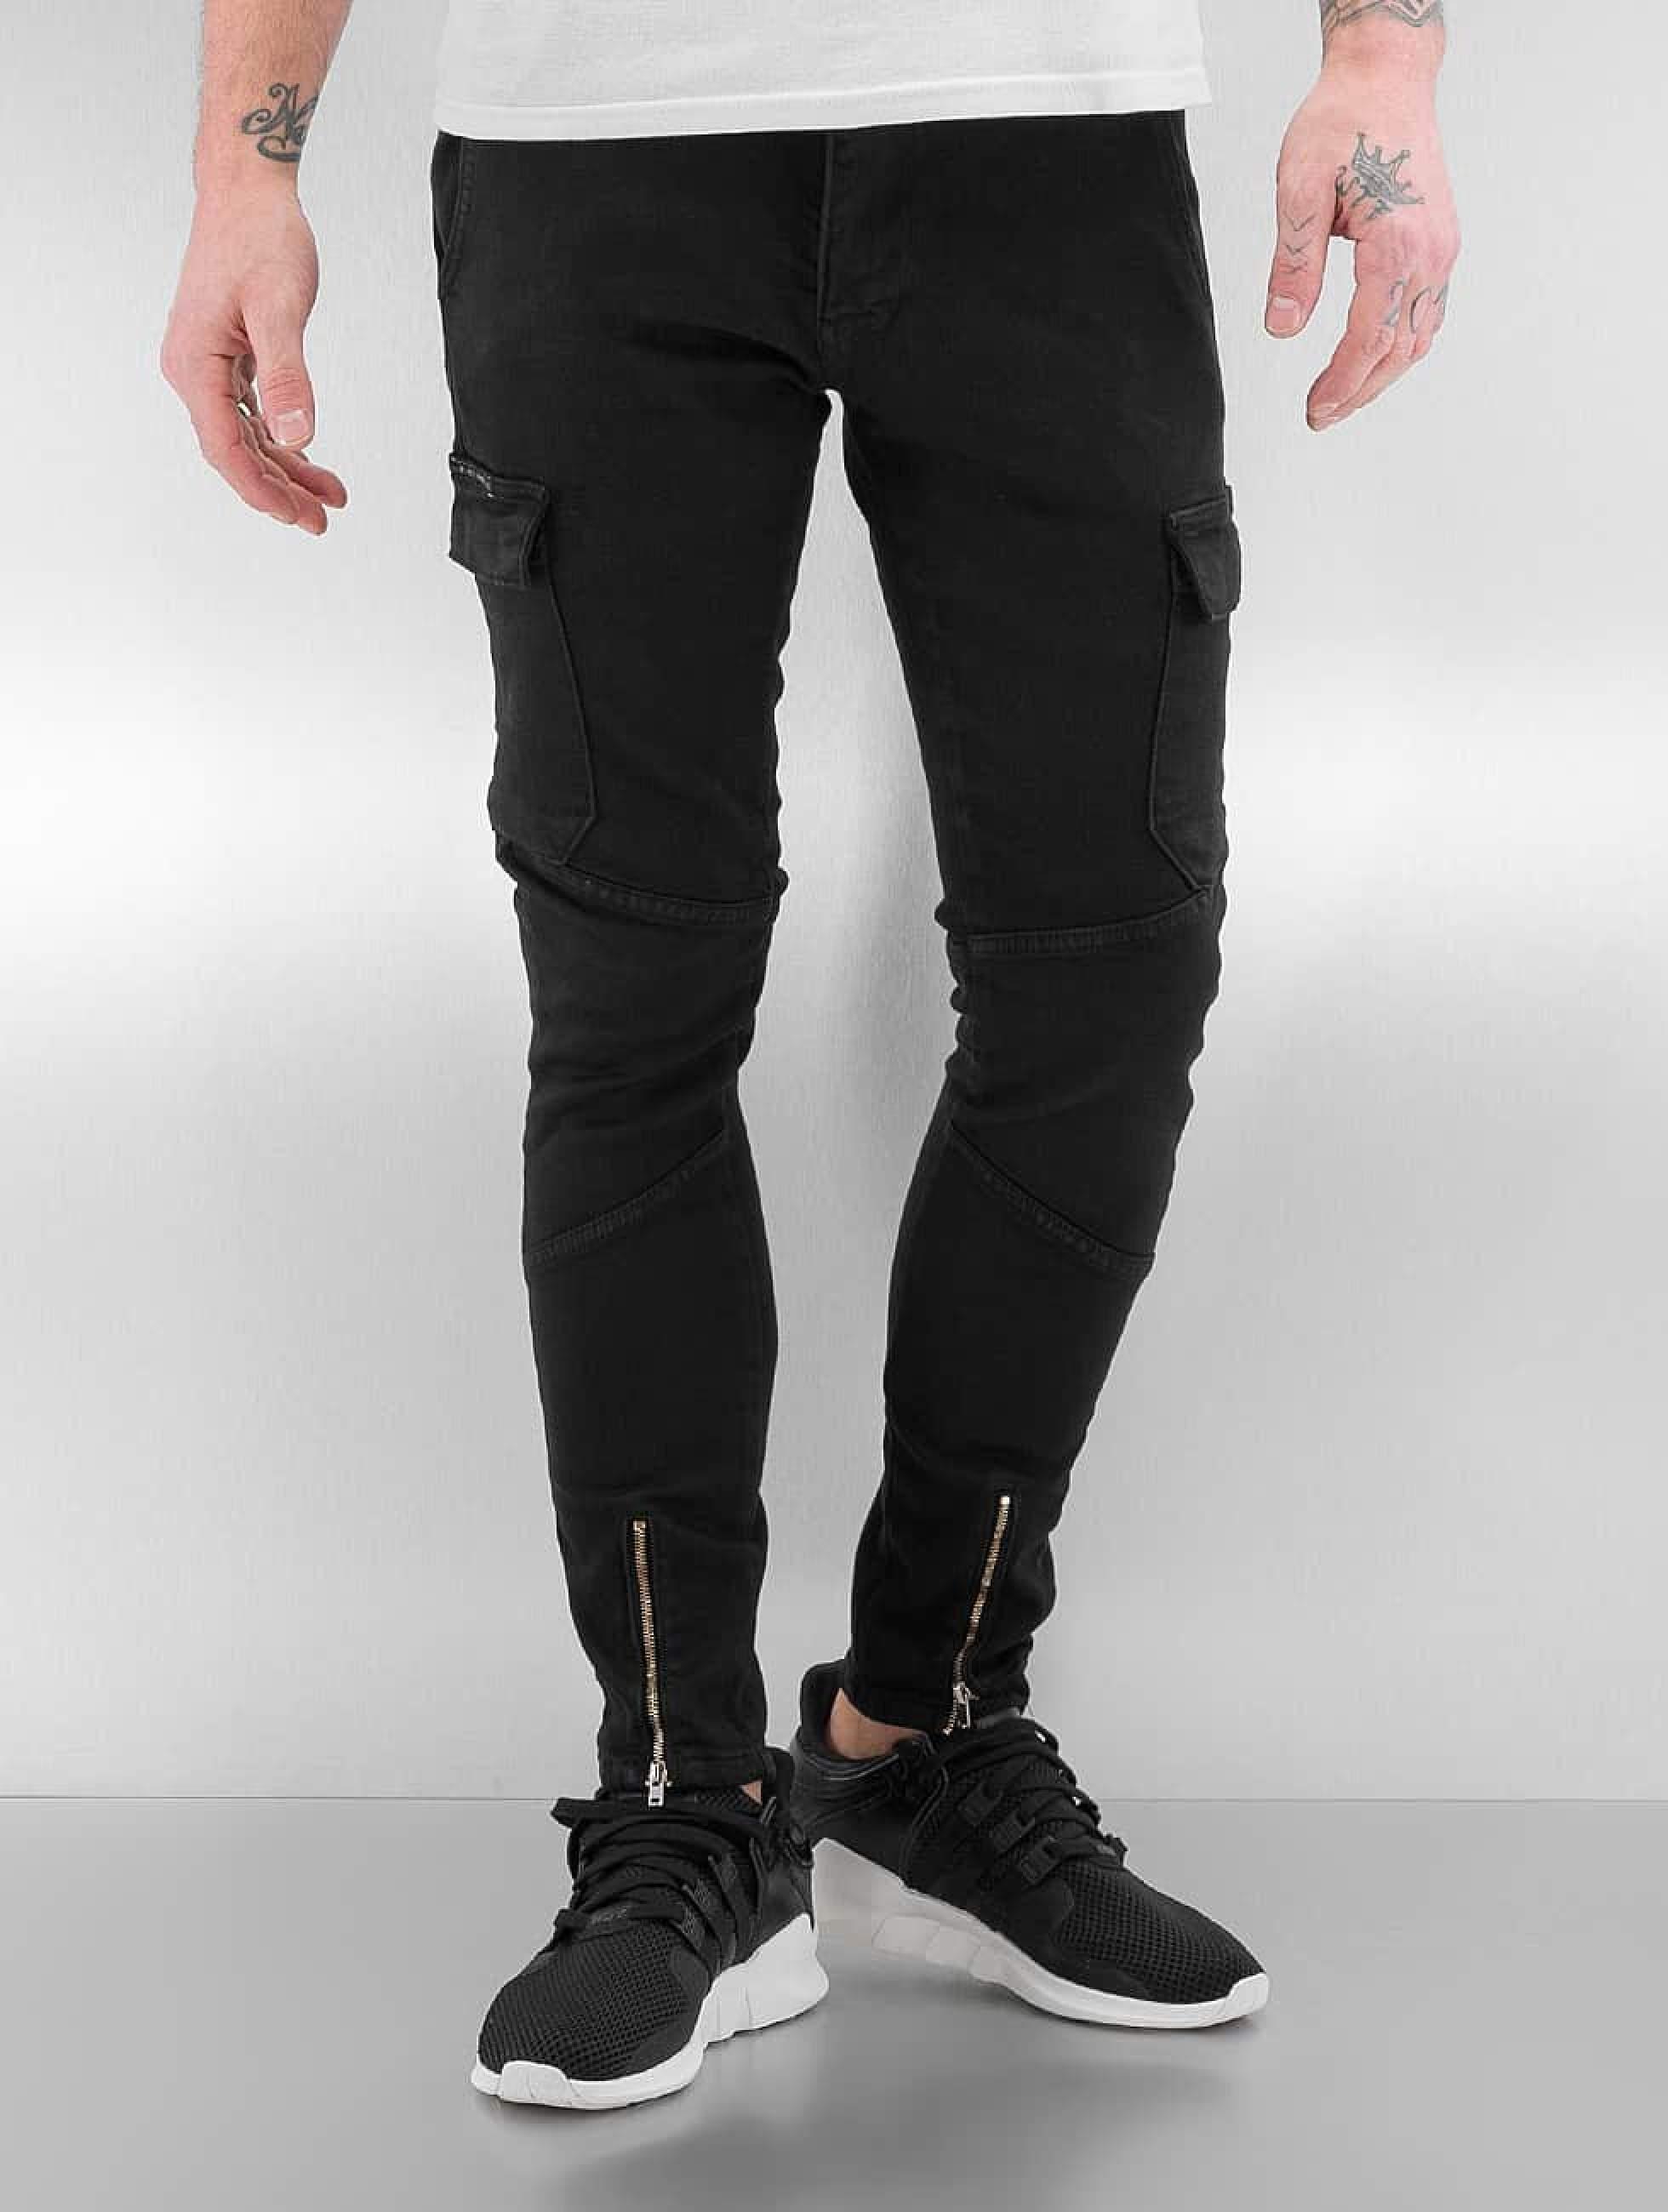 2Y / Skinny Jeans Bristol in black W 33